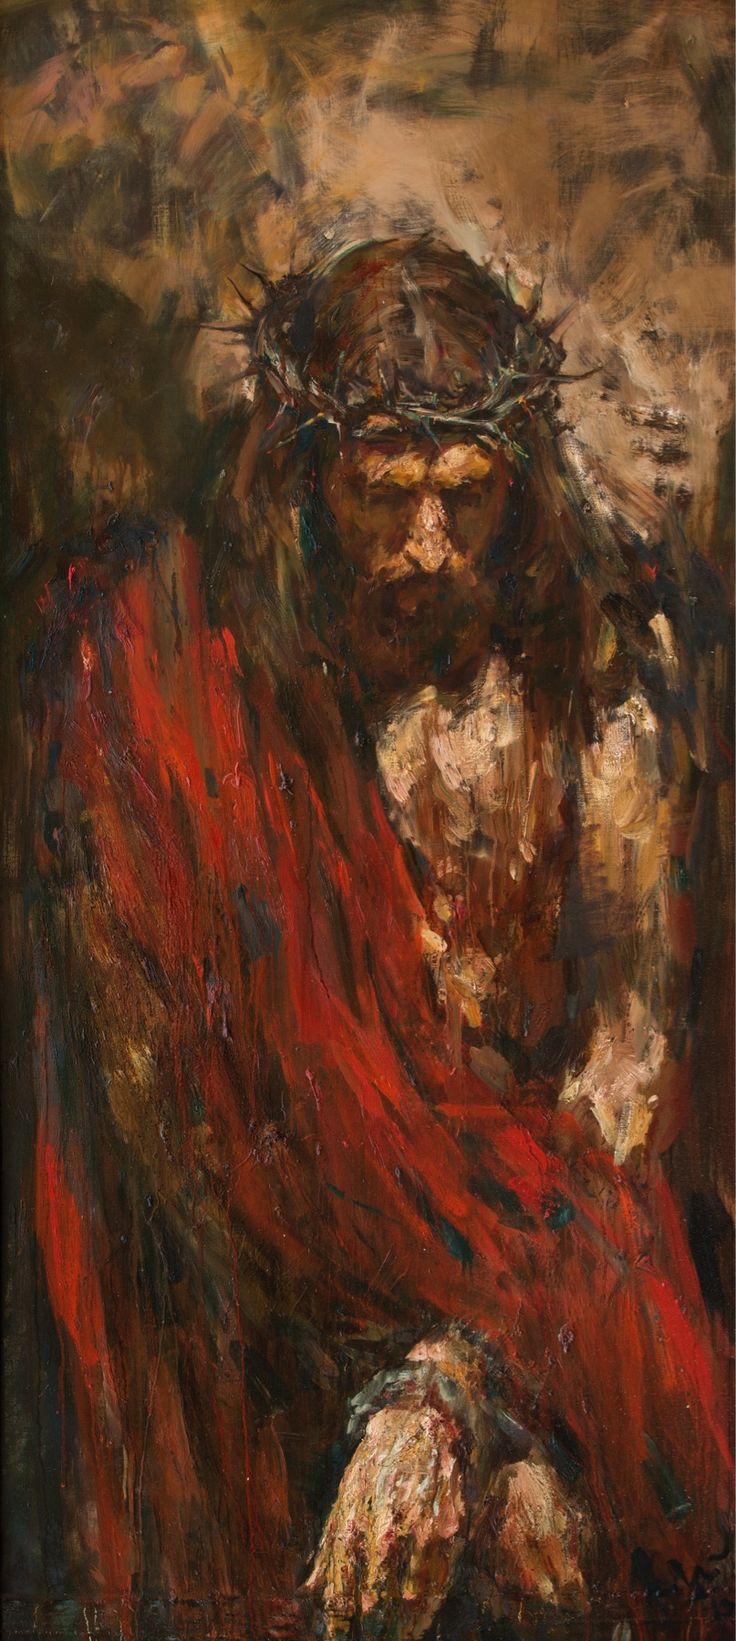 """Ecce homo"", 208x95 cm, oil on canvas,2013. Anatoly Shumkin"